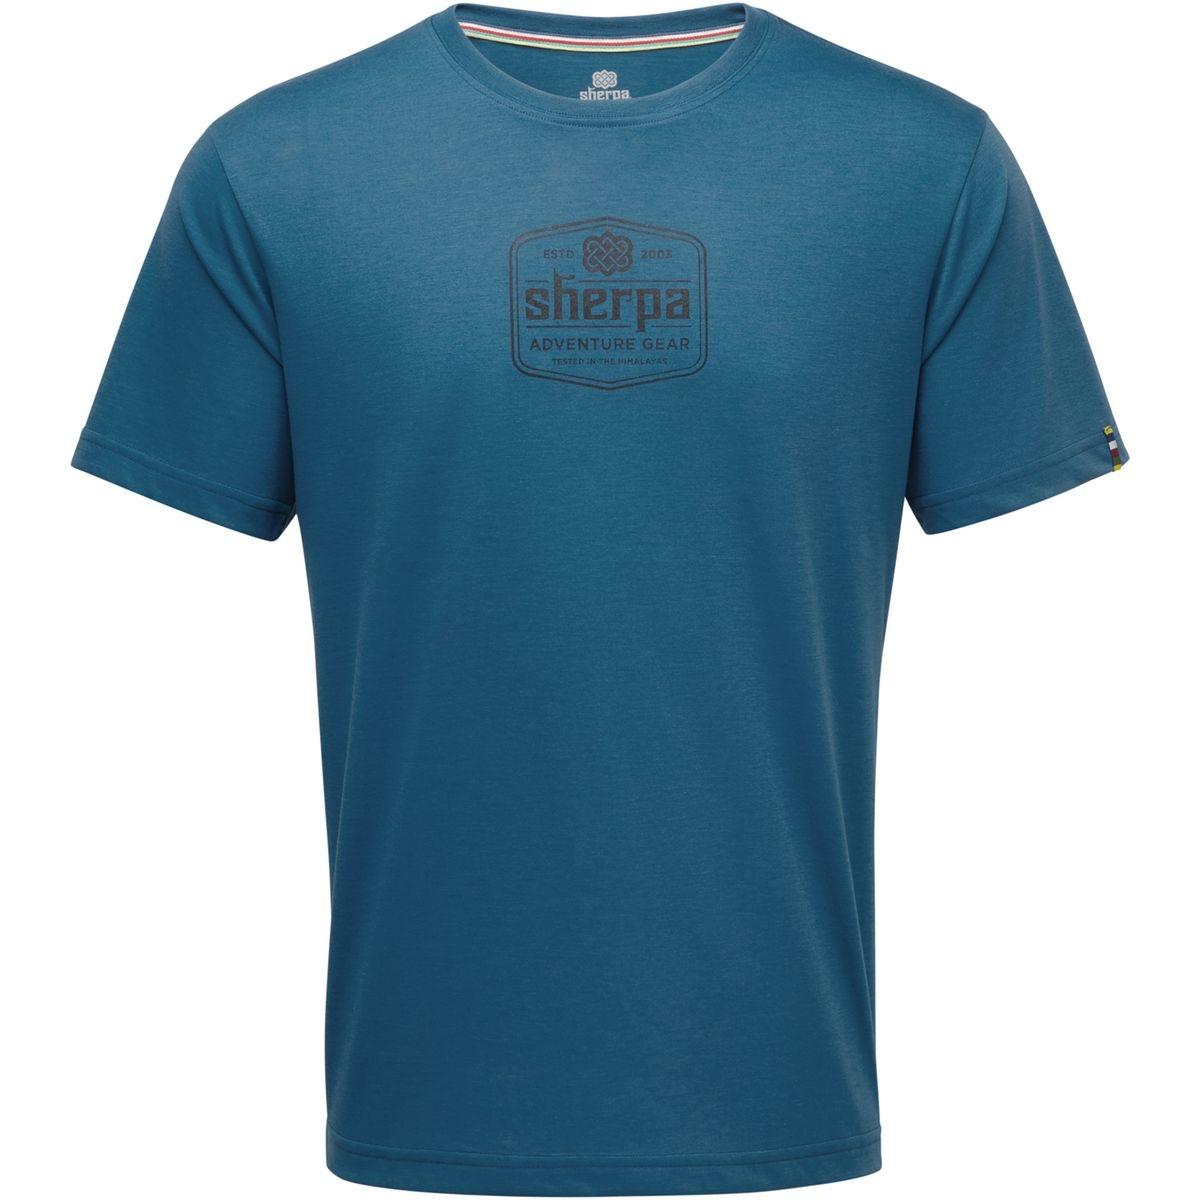 Tashi - T-shirt manches courtes Homme - bleu